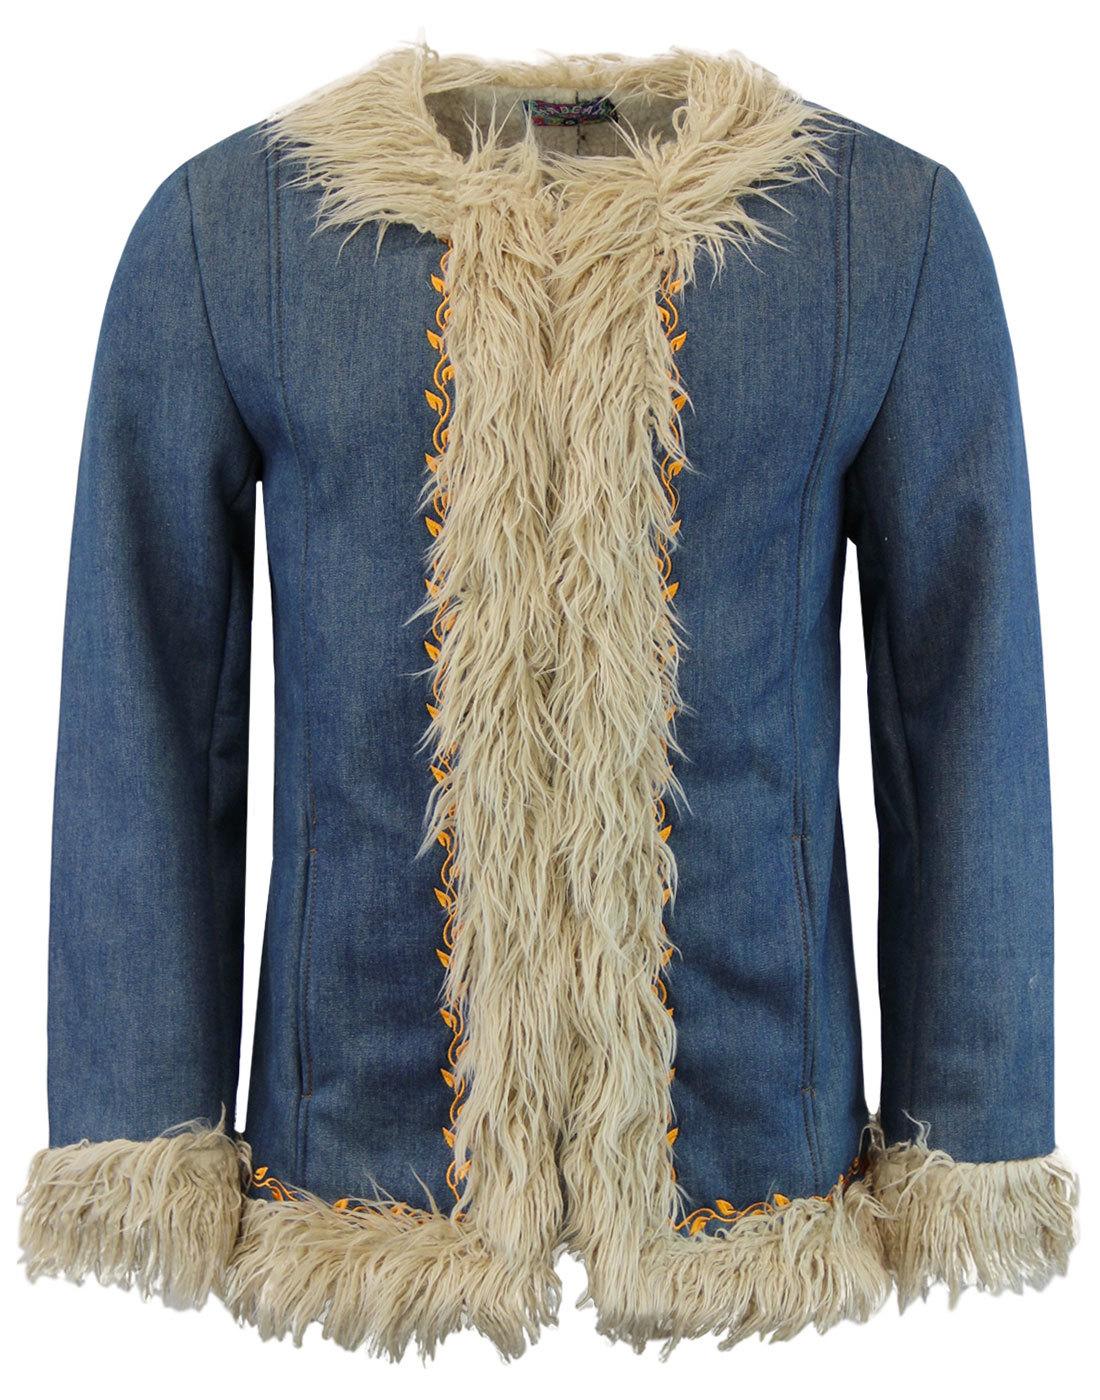 Walrus MADCAP ENGLAND Retro 60s Denim Afghan Coat